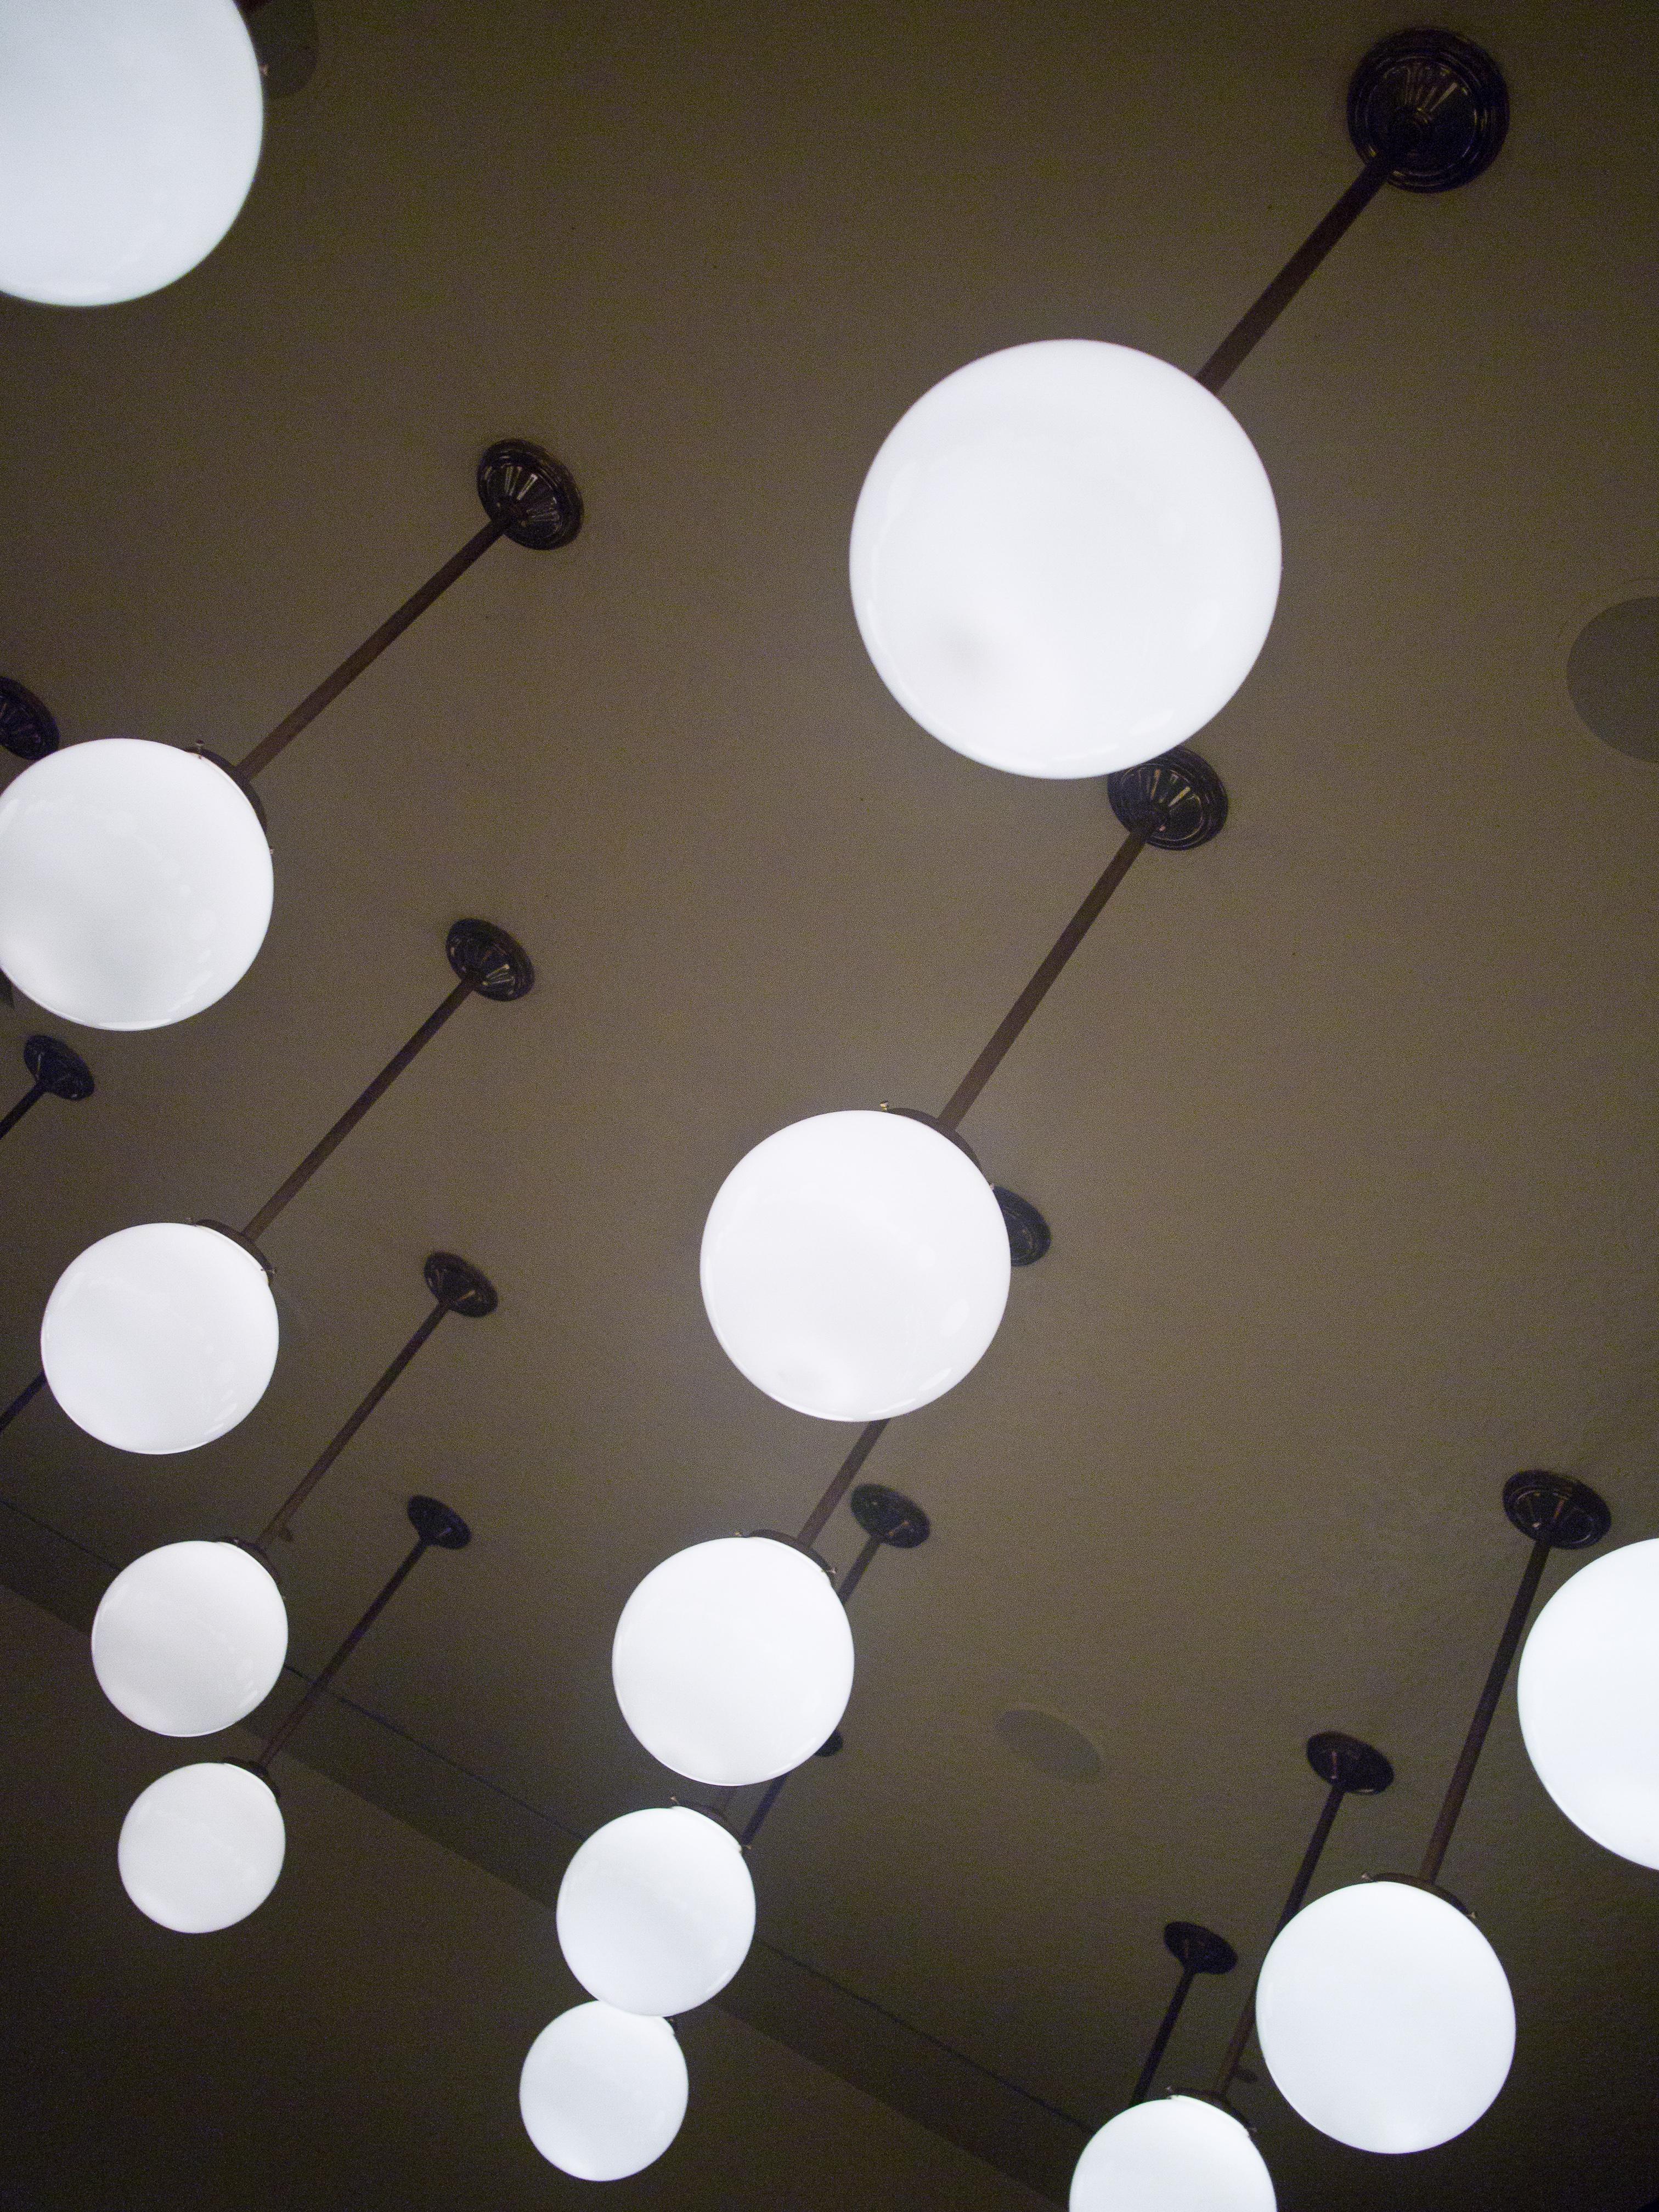 Fileceiling light fixturesg wikimedia commons fileceiling light fixturesg arubaitofo Image collections